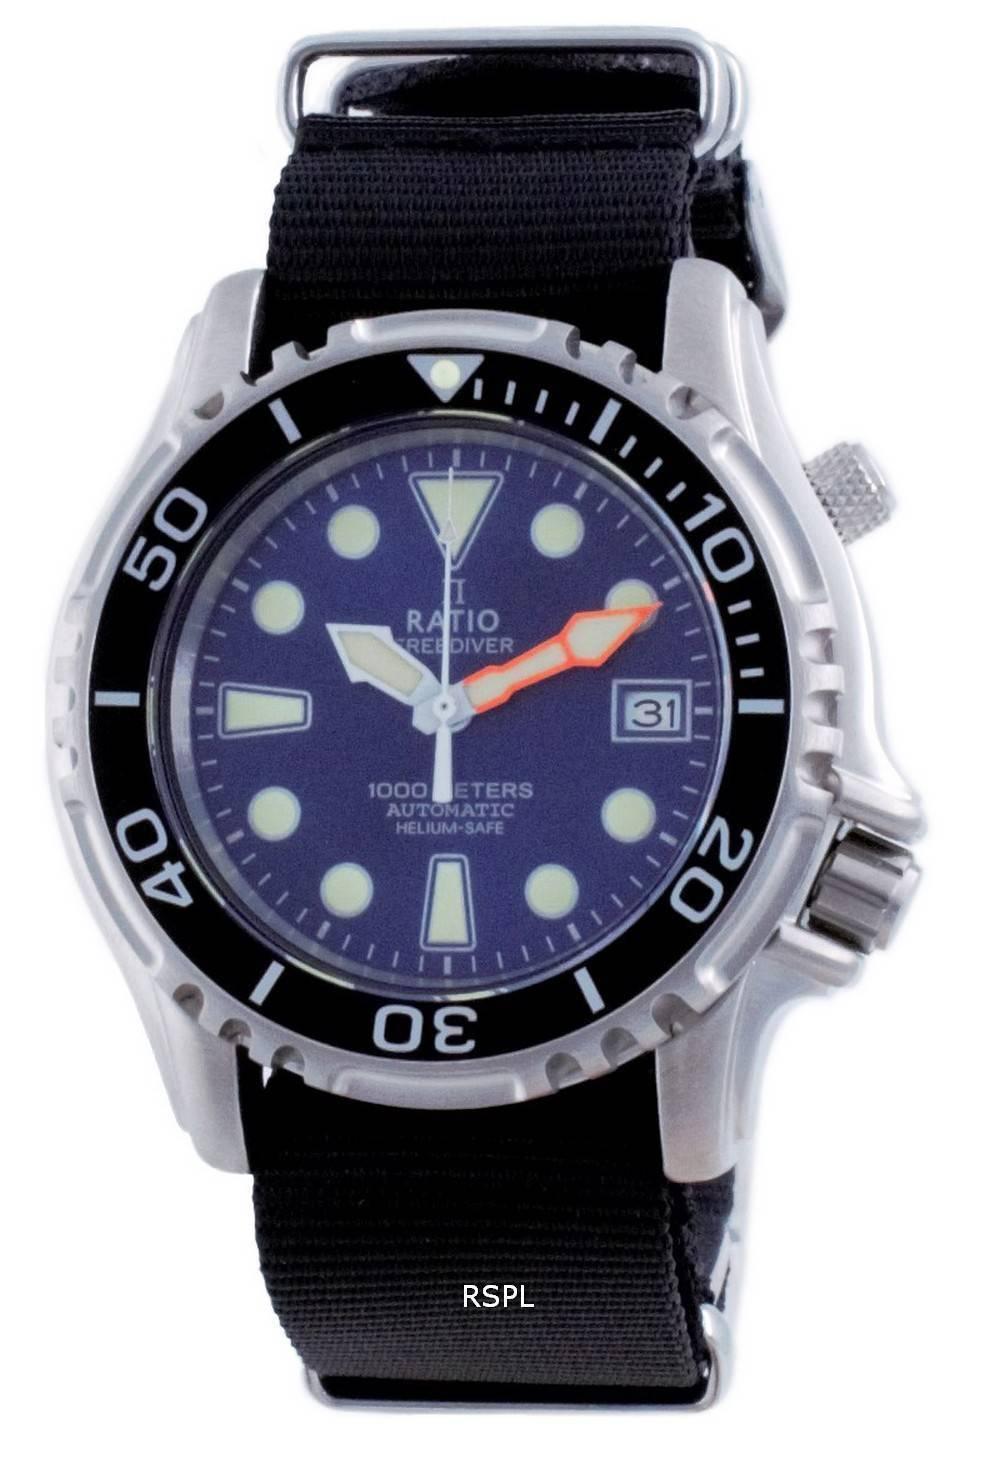 Suhde vapaa Diver Helium Safe Nylon Automatic Diver&#39,s 1066KE20-33VA-BLU-var-NATO4 1000M miesten kello